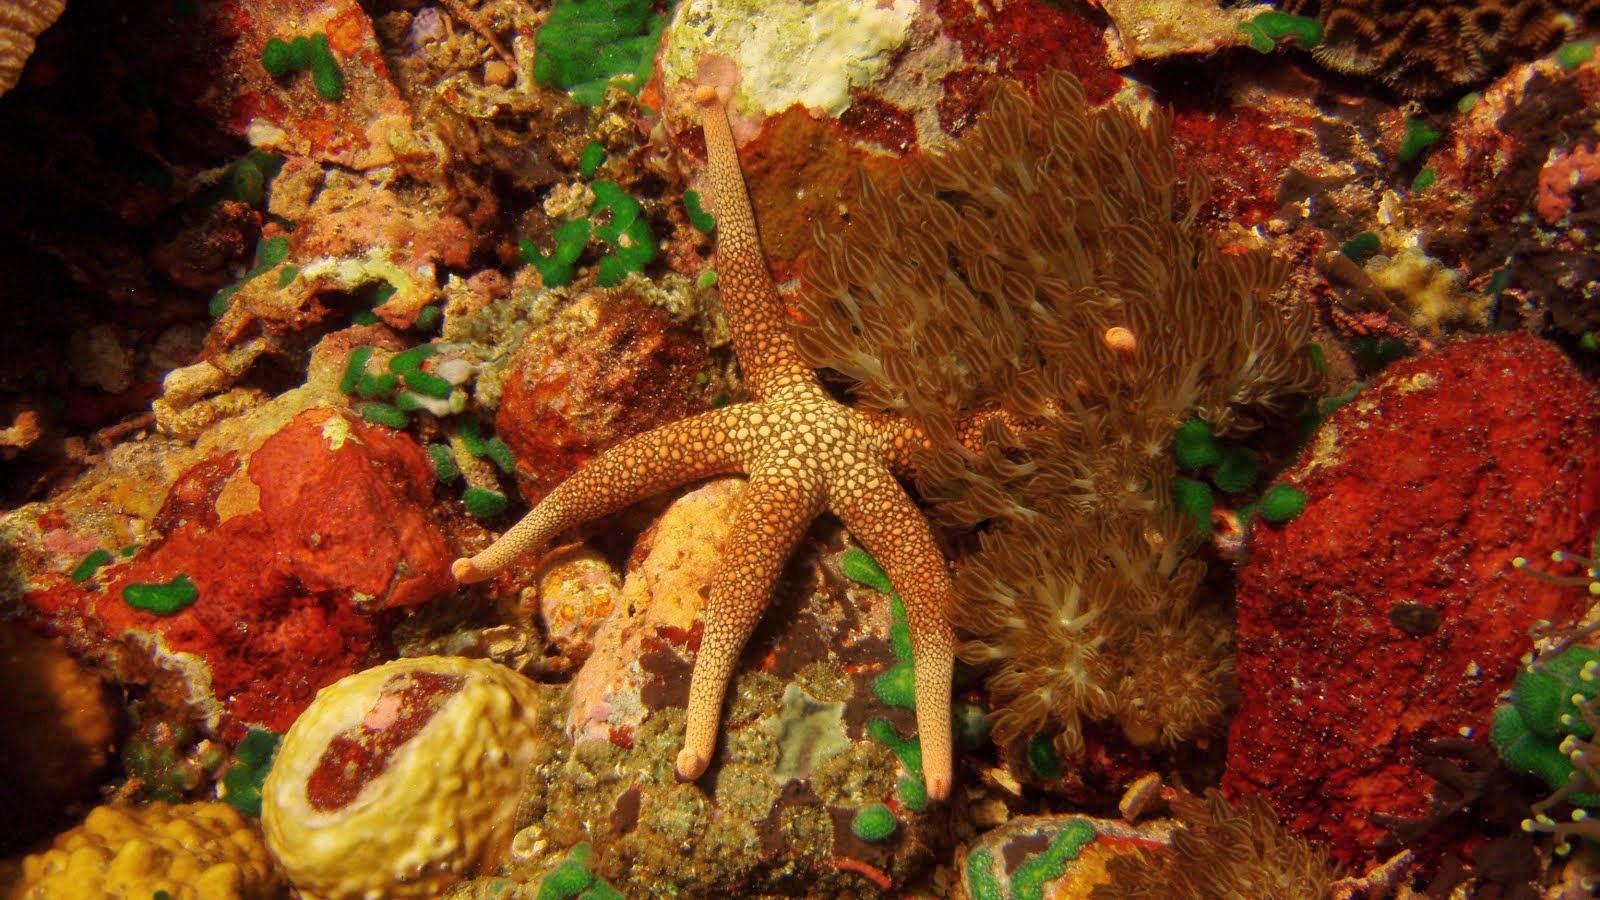 Coral Reef Colors